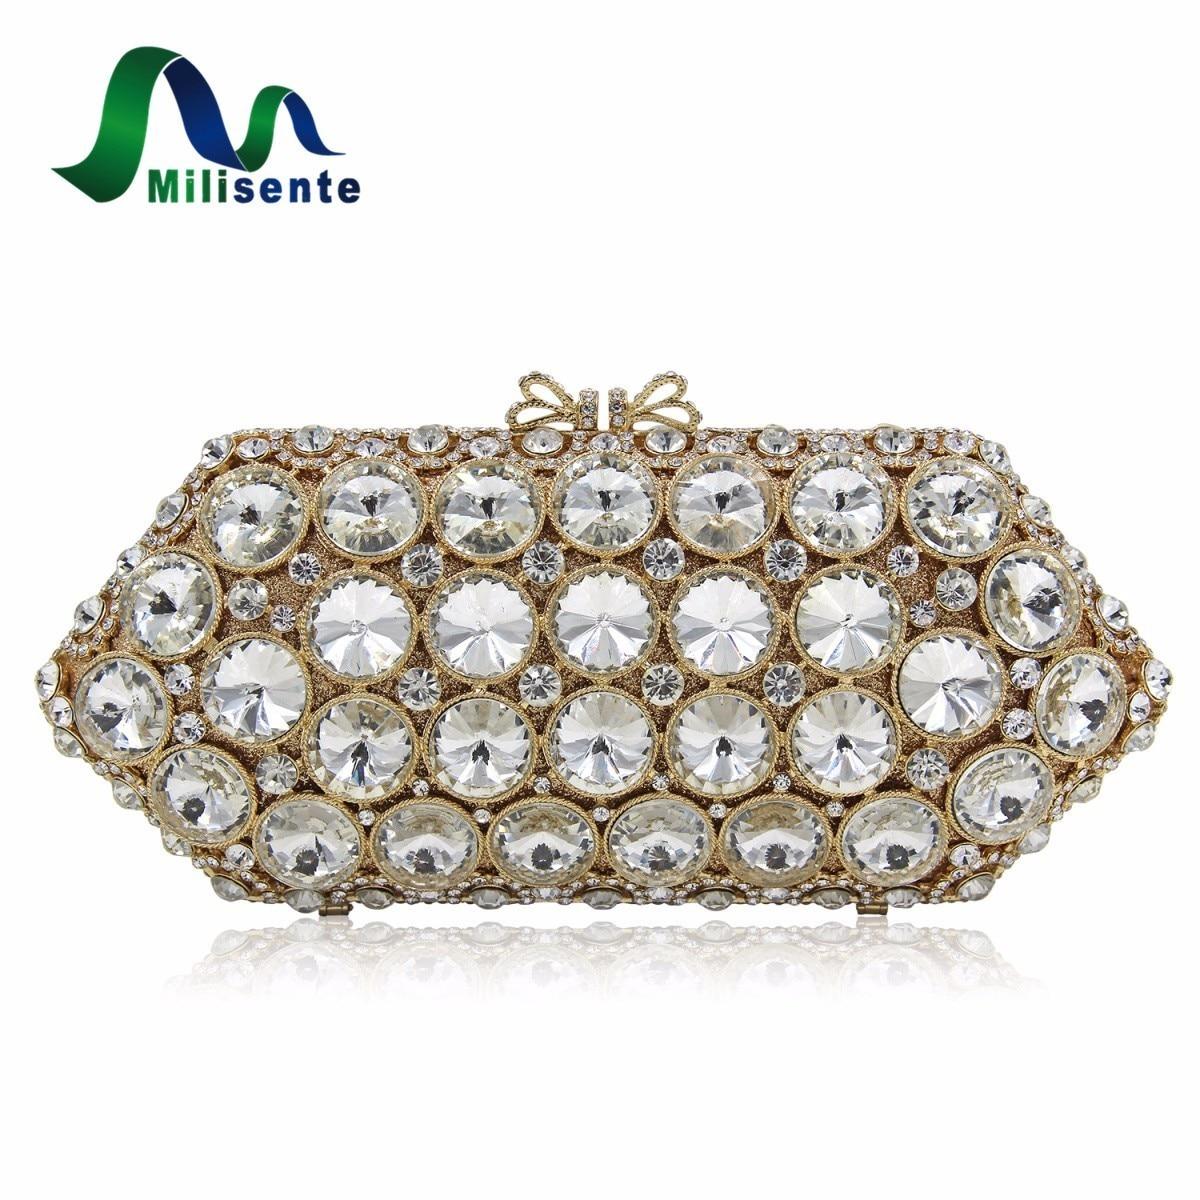 Milisente Women Crystal Bag White Stone Wedding Party Clutch Bags Shoulder Long Chain Handbag Gold